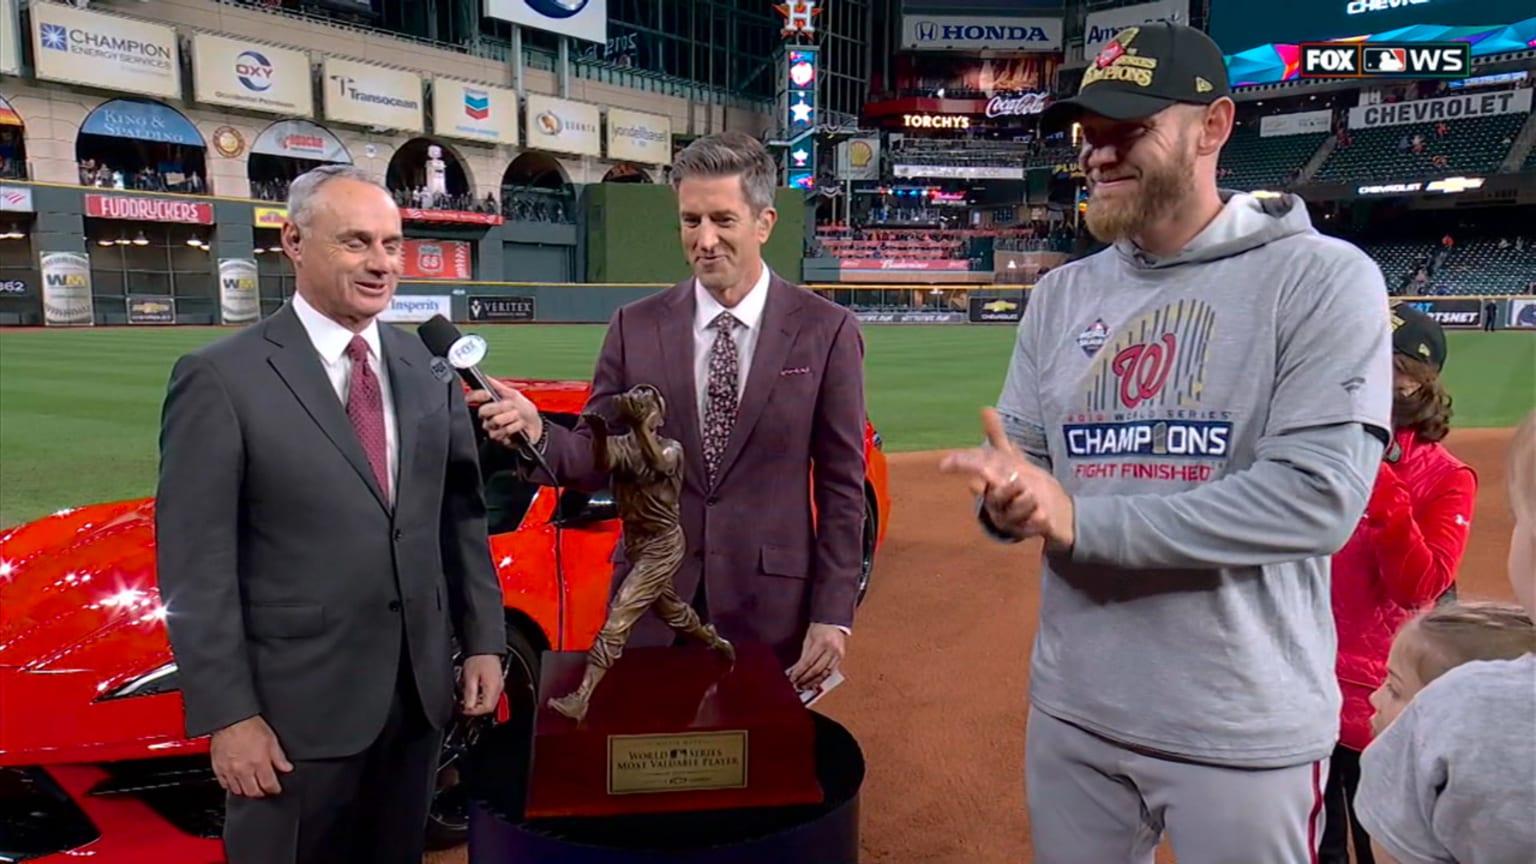 Strasburg wins World Series MVP | 10/31/2019